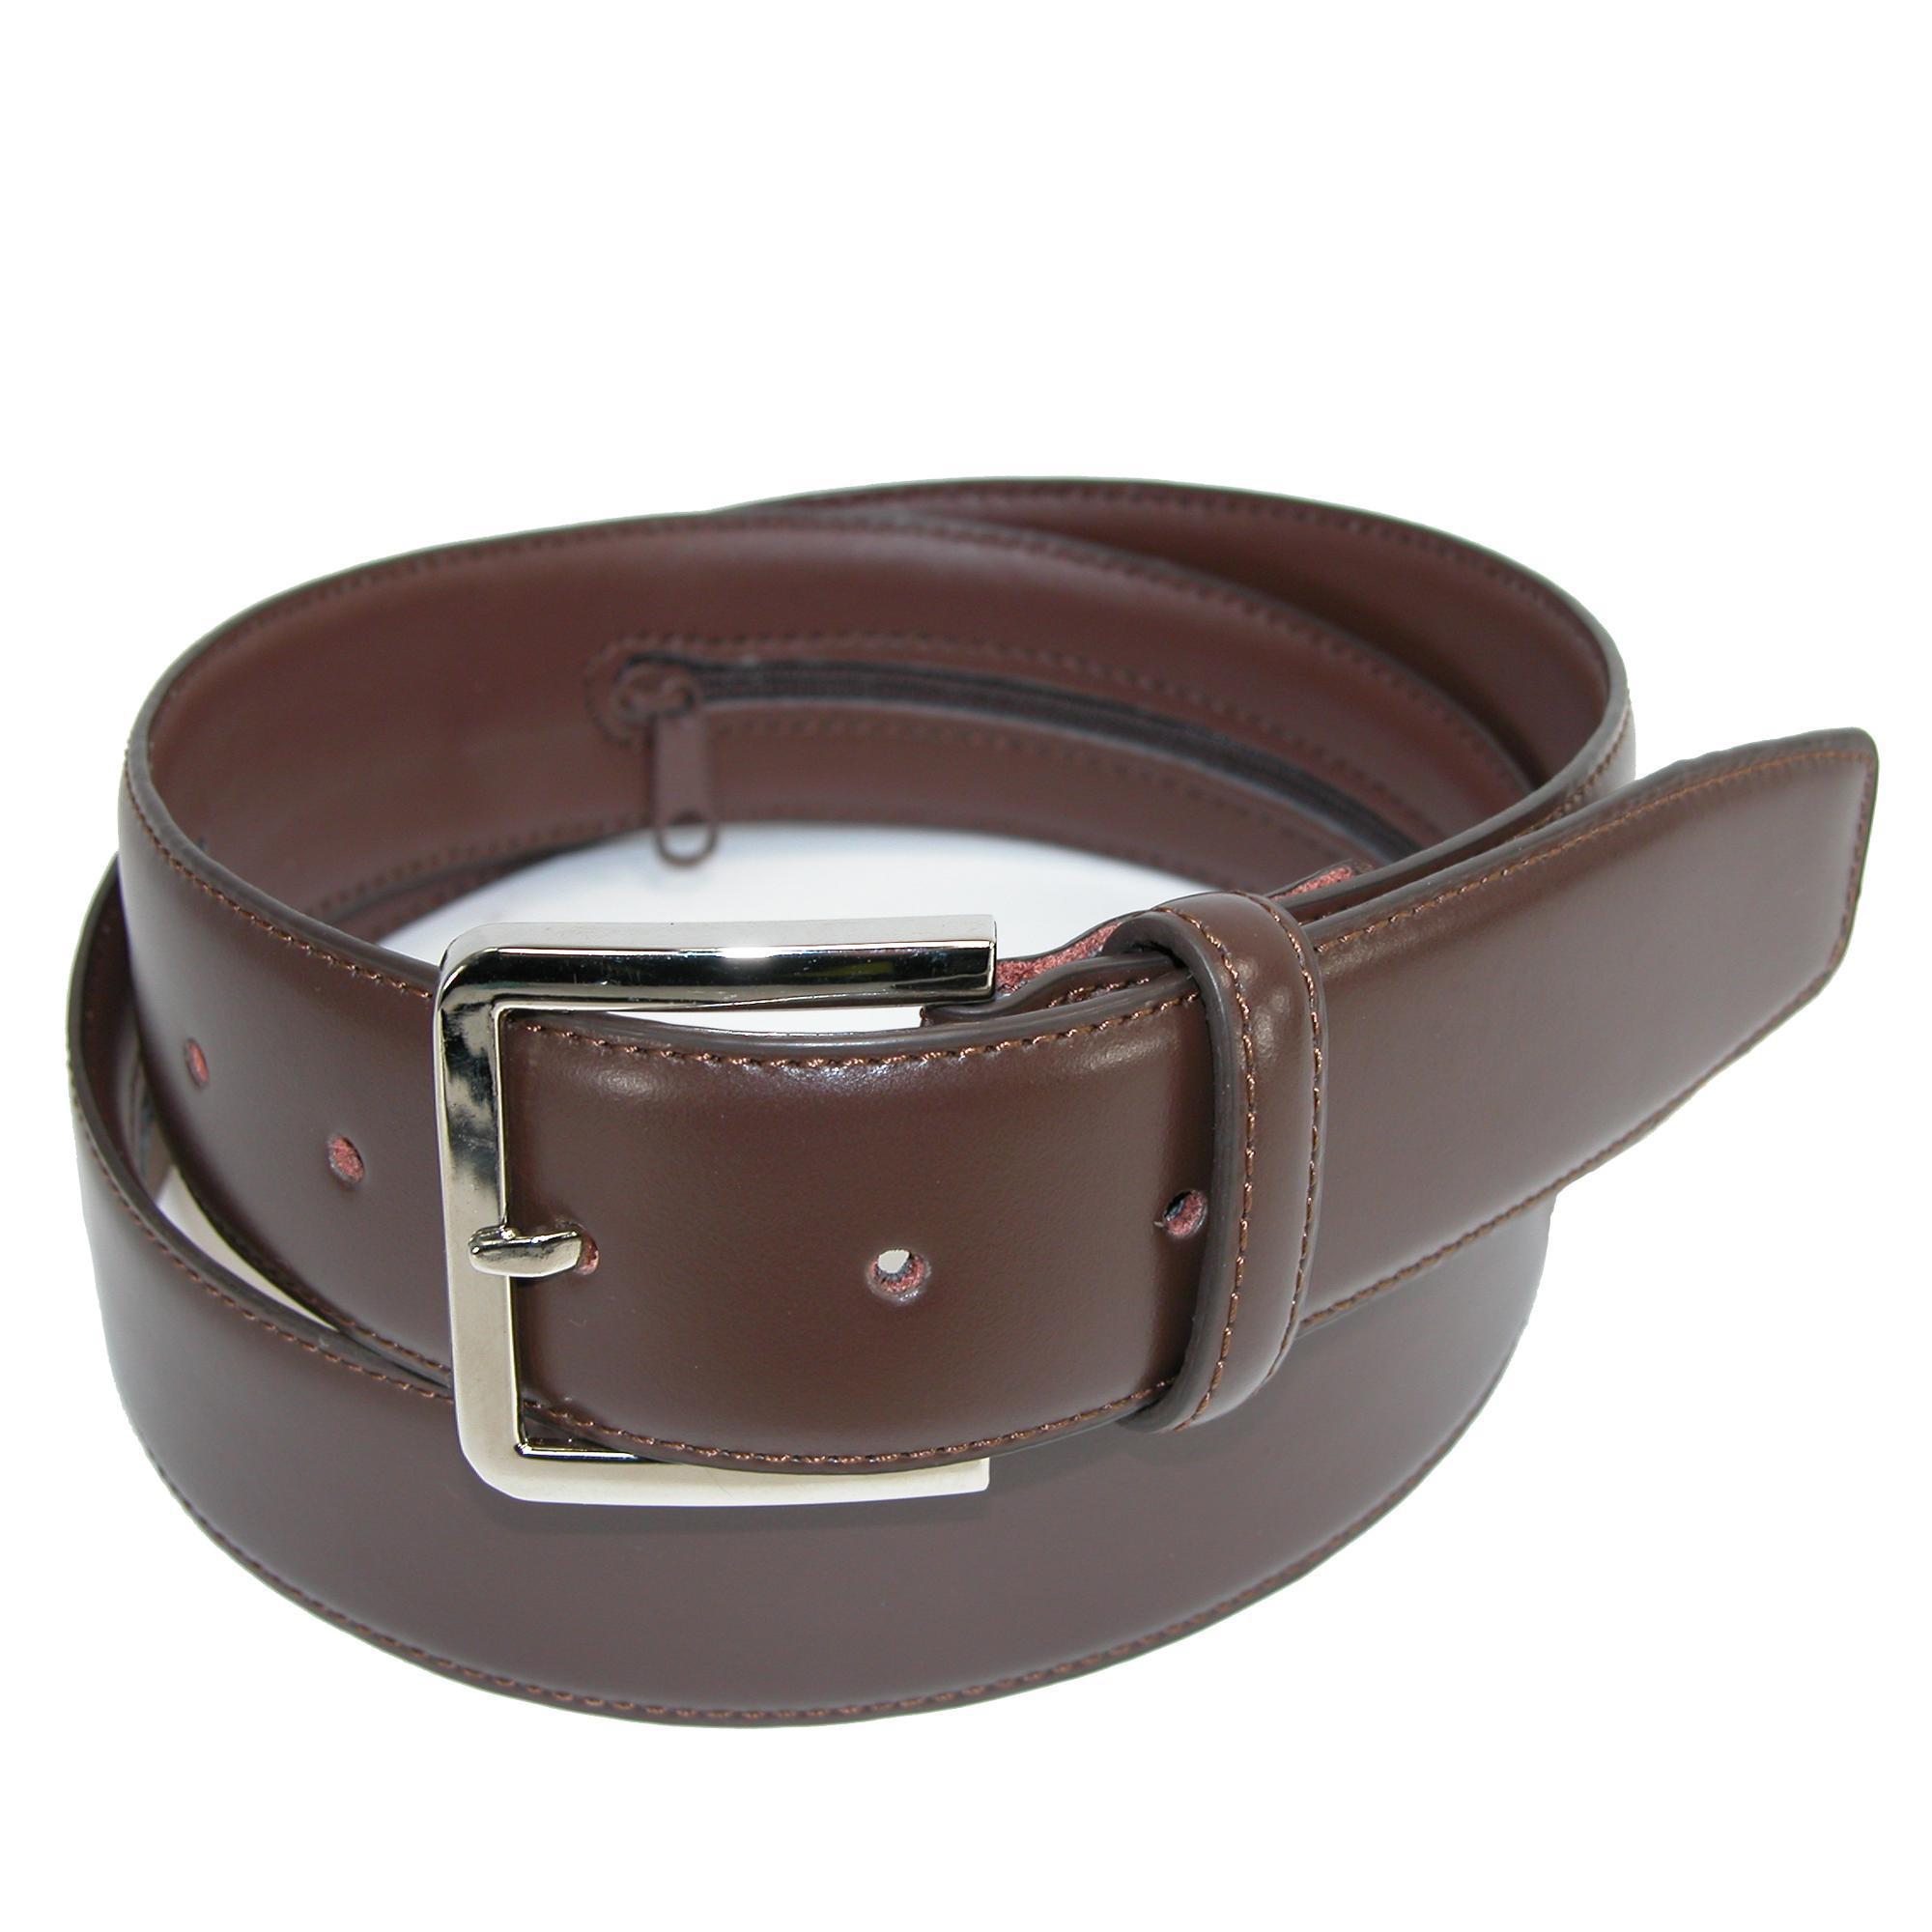 Ctm Mens Leather Travel Money Belt (large Sizes Available)